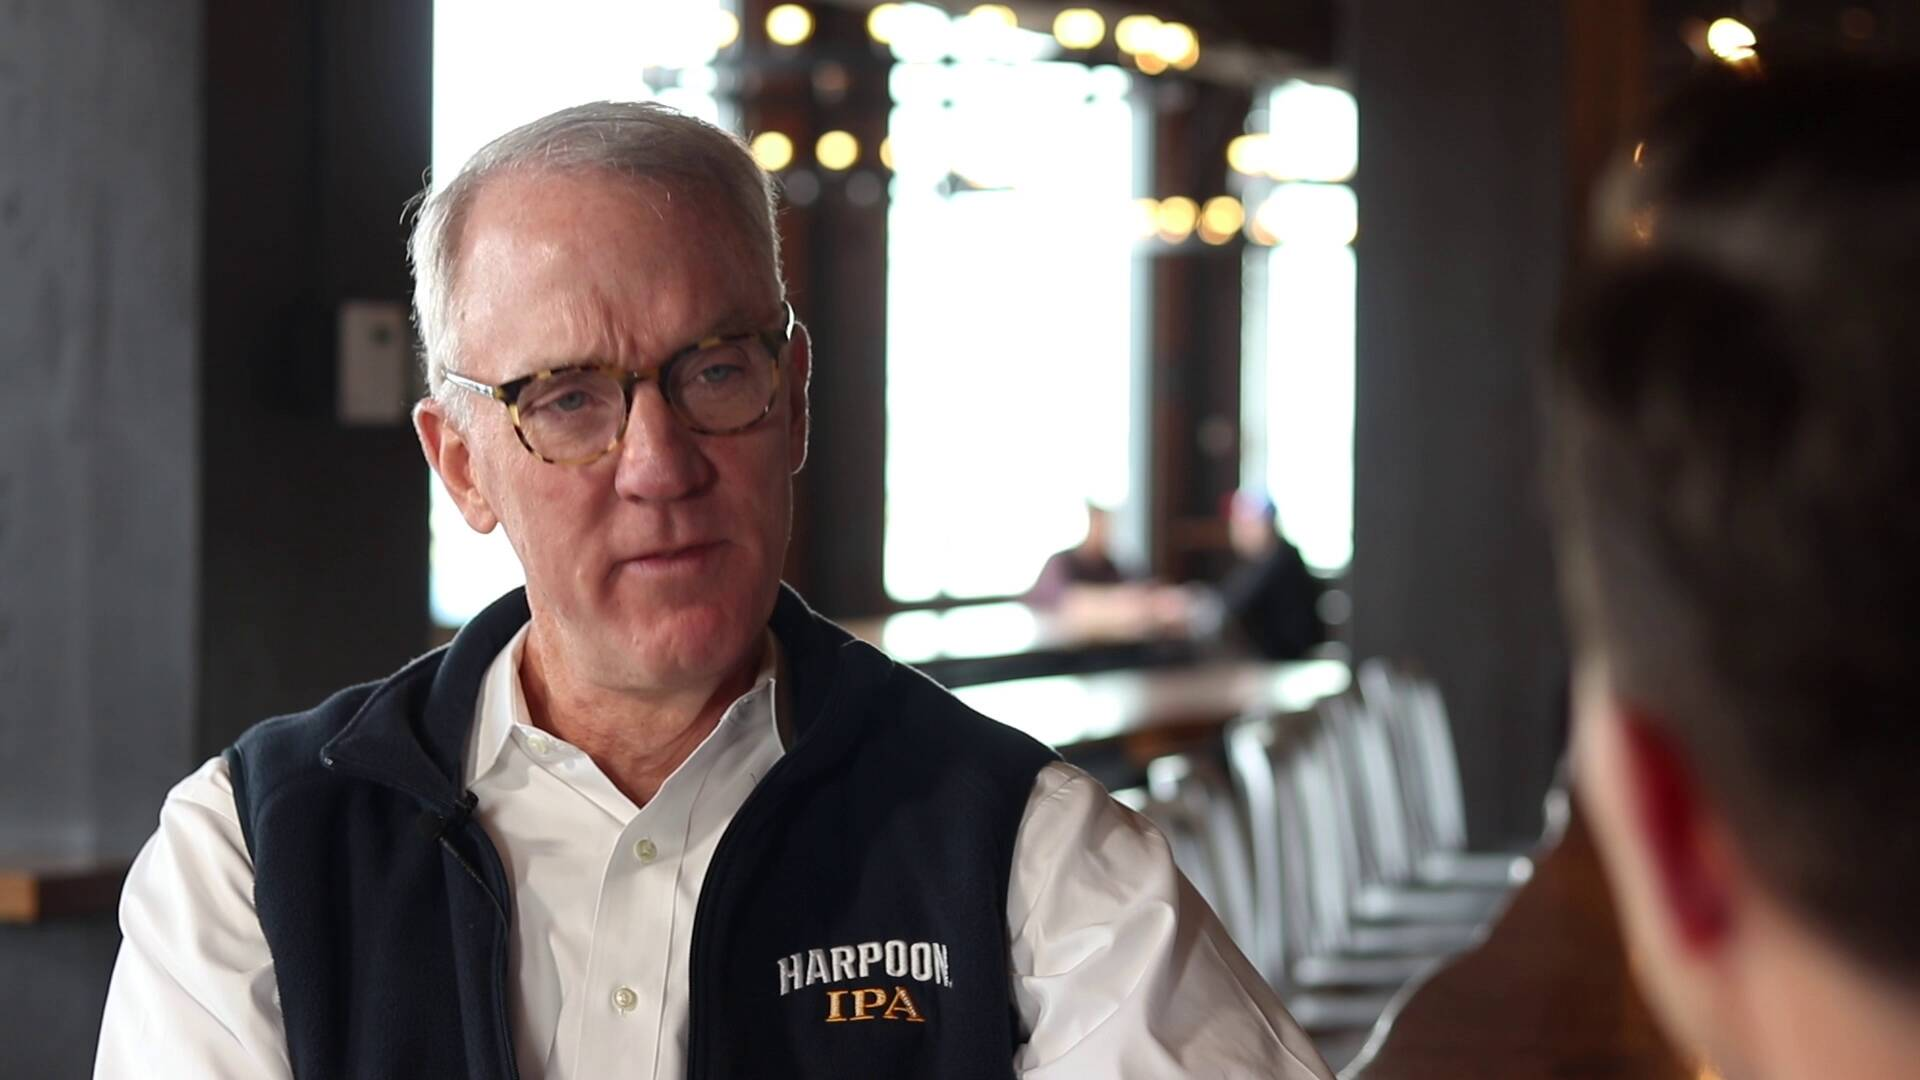 Episode 1: Dan Kenary | Harpoon